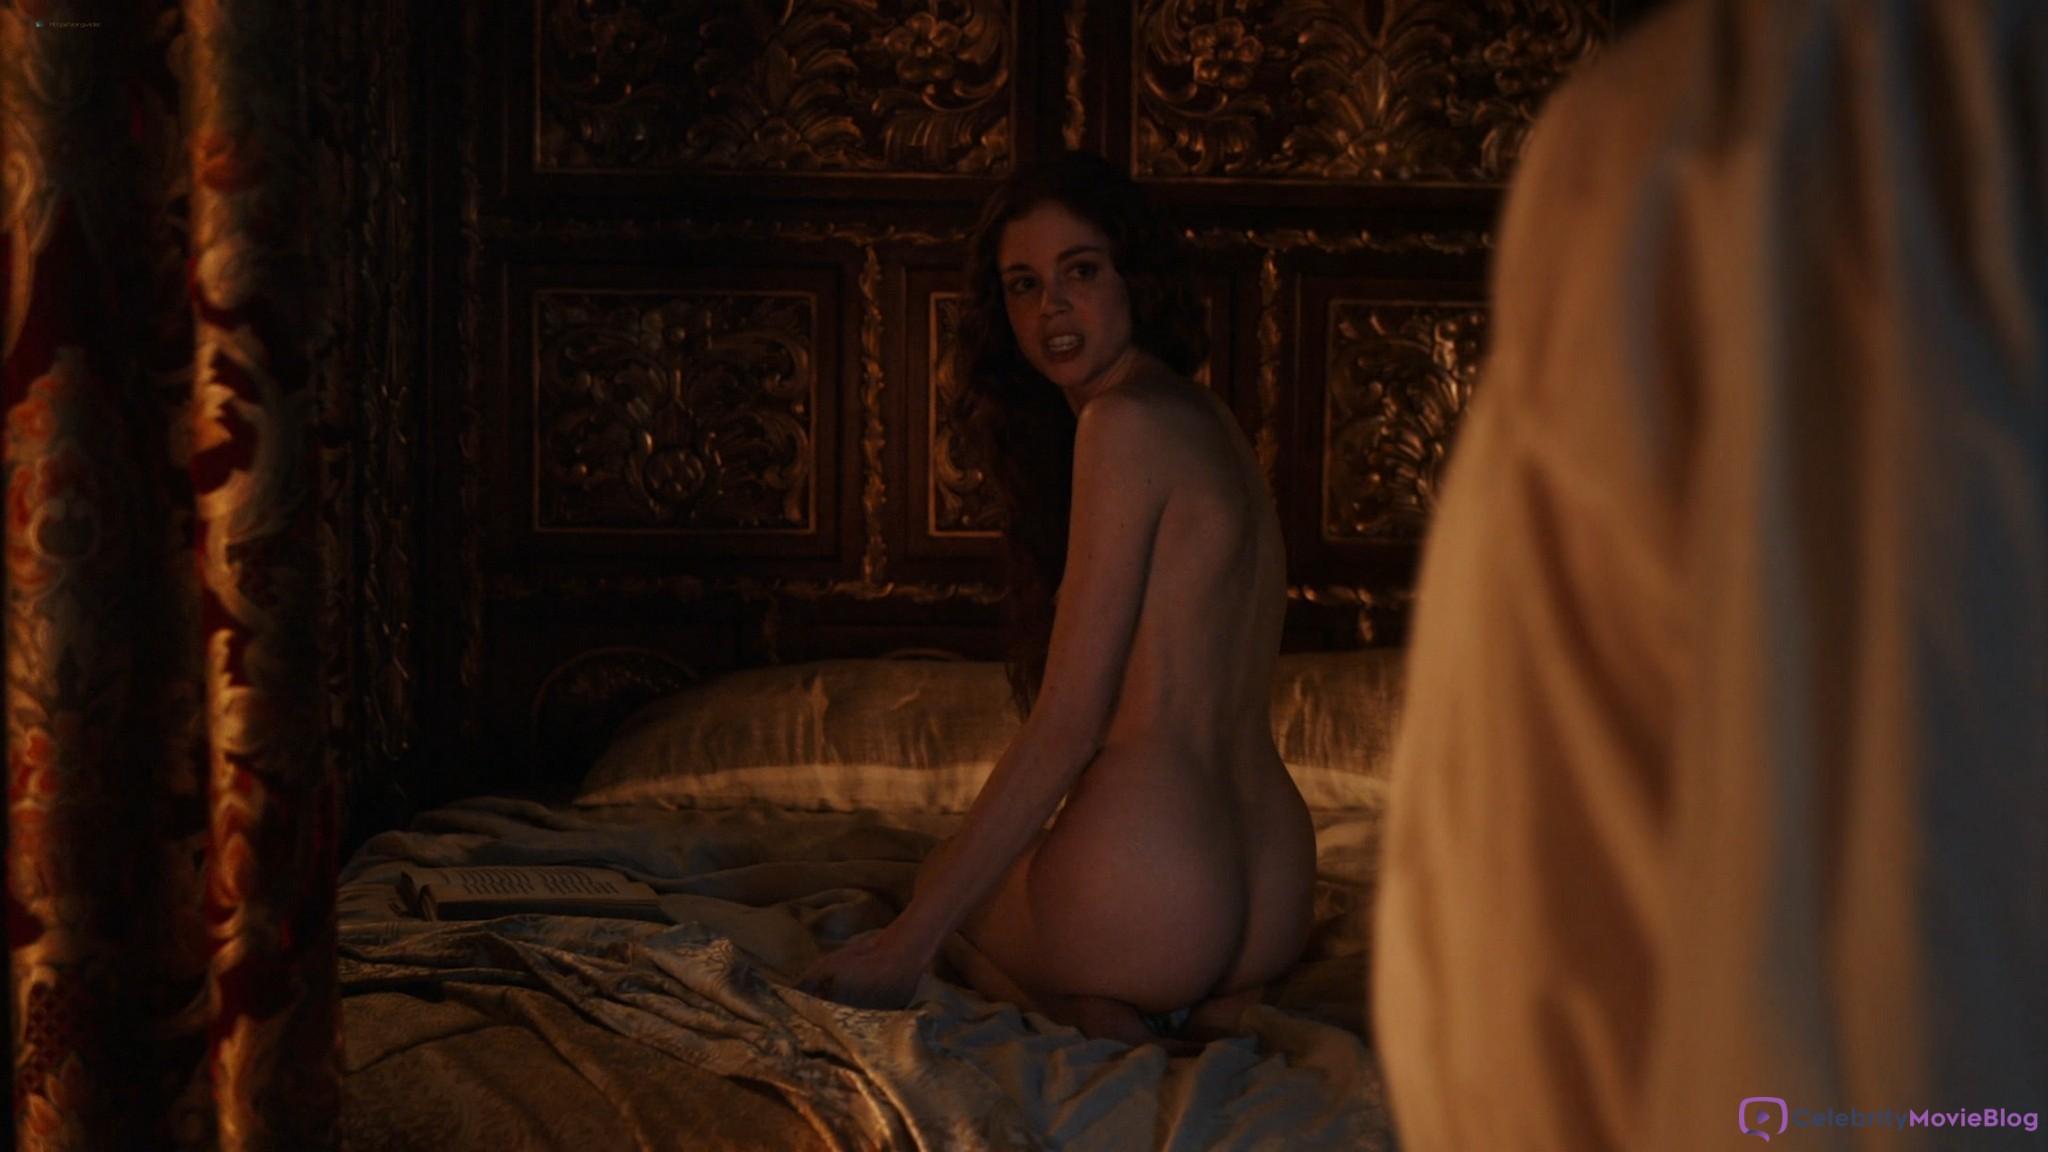 Hope naked charlotte 44 Jaw